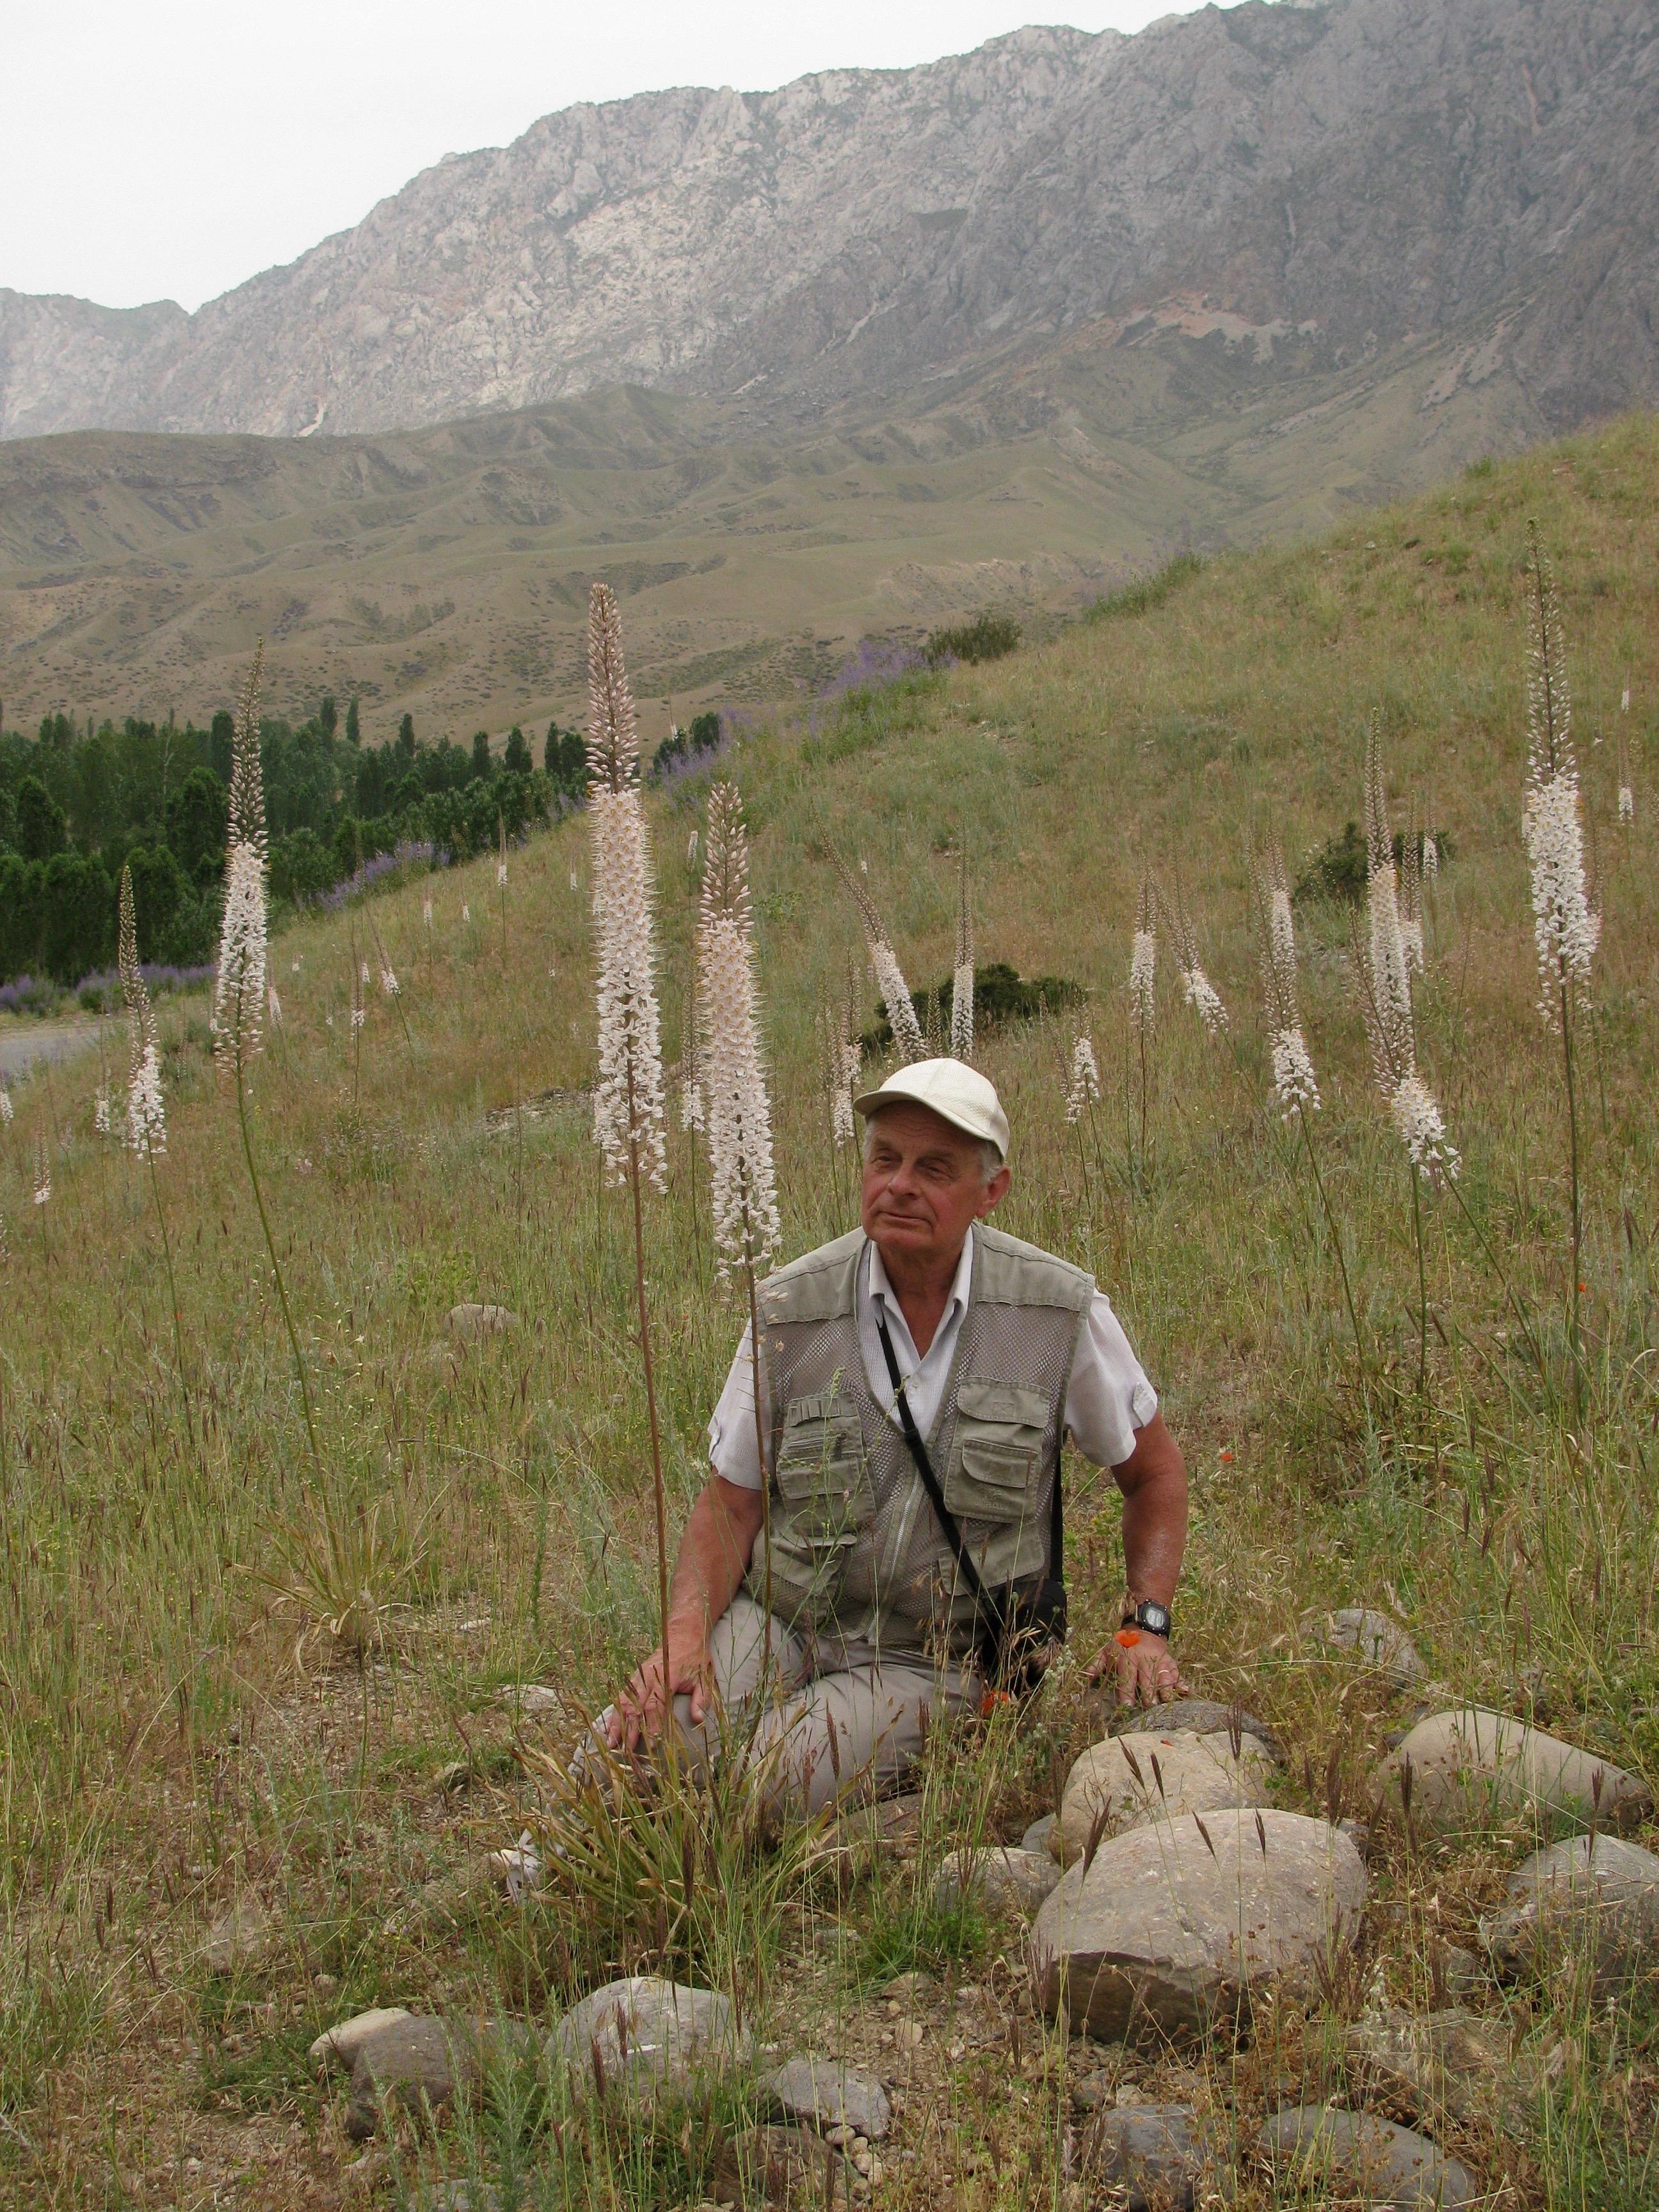 Eremurus tianschanicus (Asphodelaceae) and prof. Kaabak